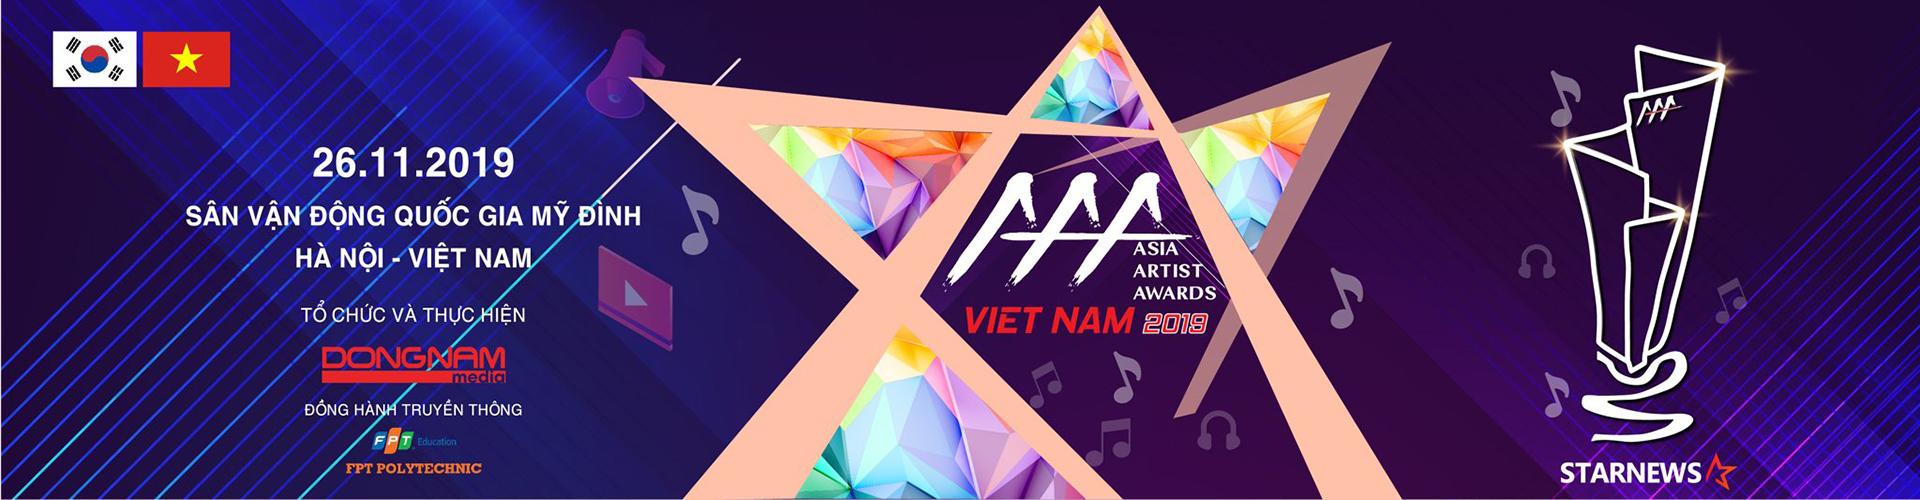 Mua vé Asia Artist Awards - Shop VnExpress